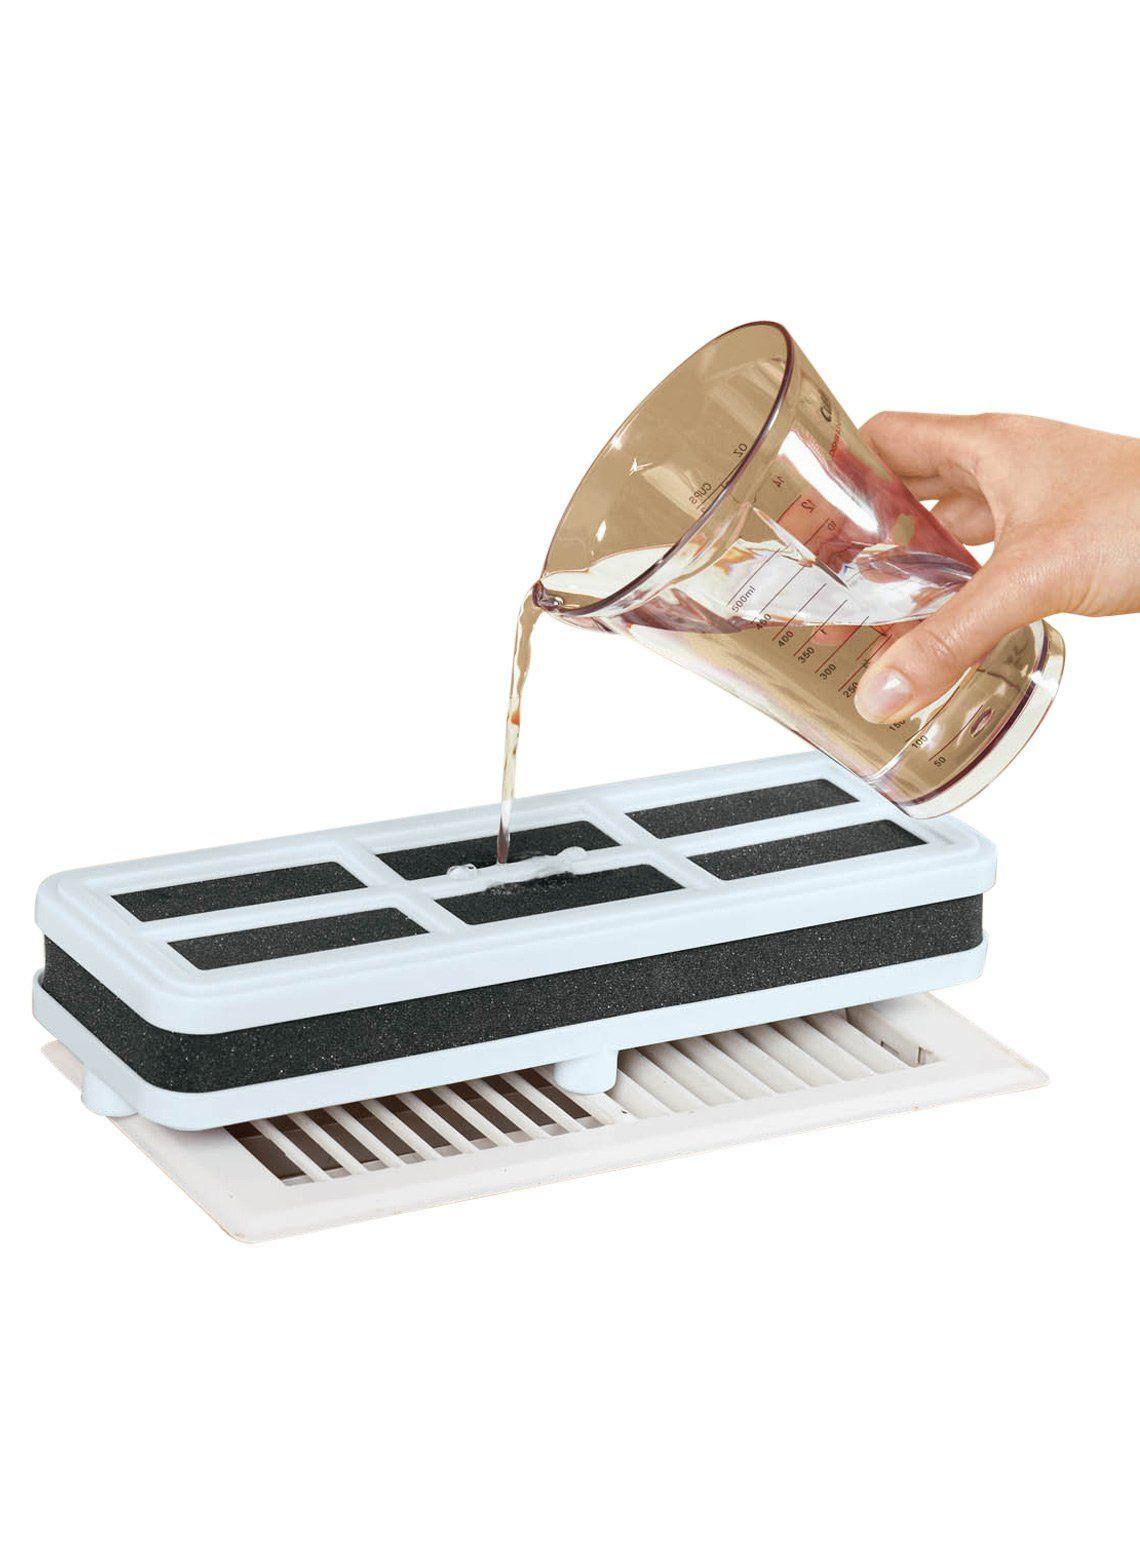 NonElectric Room Humidifier Room humidifier, Humidifier